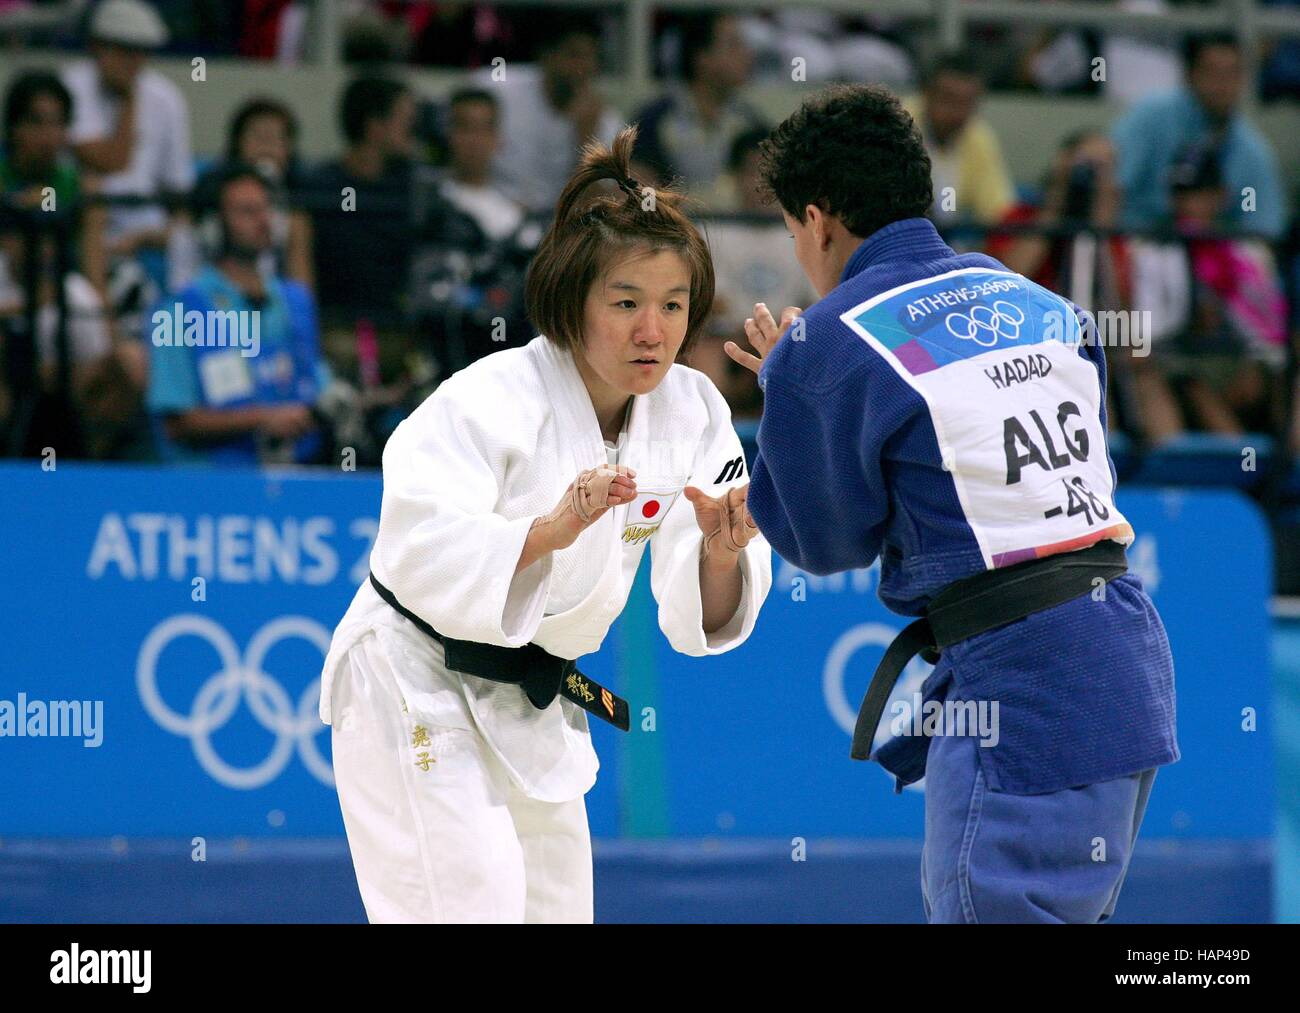 RYOKO TANI & S. HADDAD OLYMPIC JUDO ATHENS GREECE 13 August 2004 - Stock Image